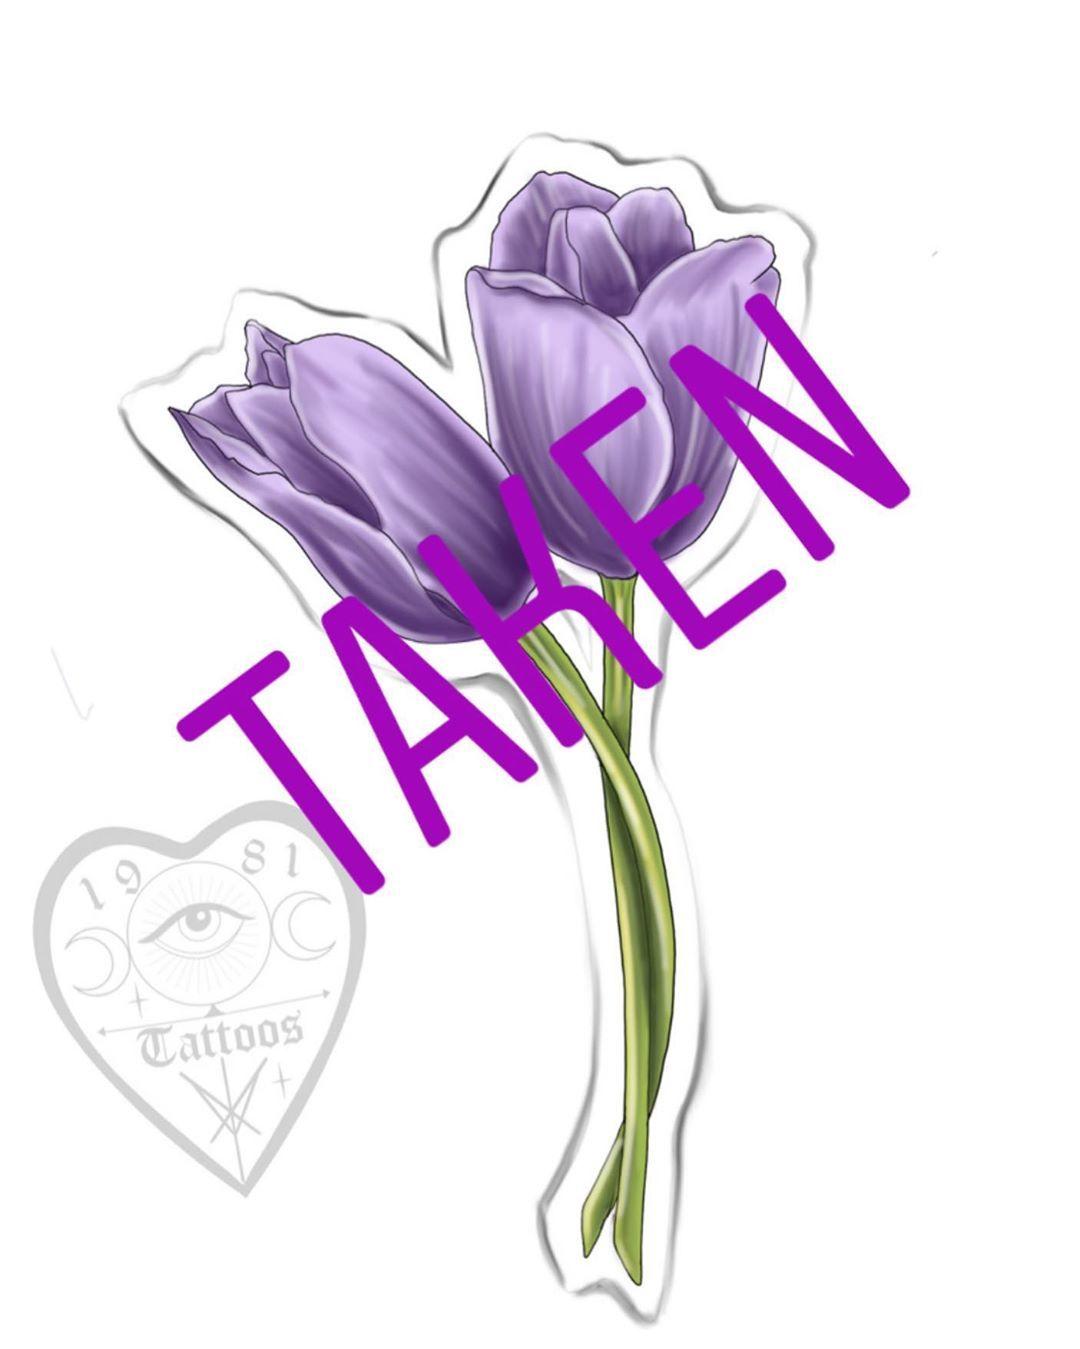 Another design taken...can't wait to get back to work 😩  #southeastlondontattoo #tattoo#tattoos #tattoodesigns #blackandgreytattoo #eternalink #newelthamtattoos #newelthamtattooist #vixtattoos #jesterstattoos #femaletattooartist #se9tattoos#greenwichtattoos#sidcuptattoos#londontattoos #newtattoo #newink#inked#tattoodesign#femaletattooist